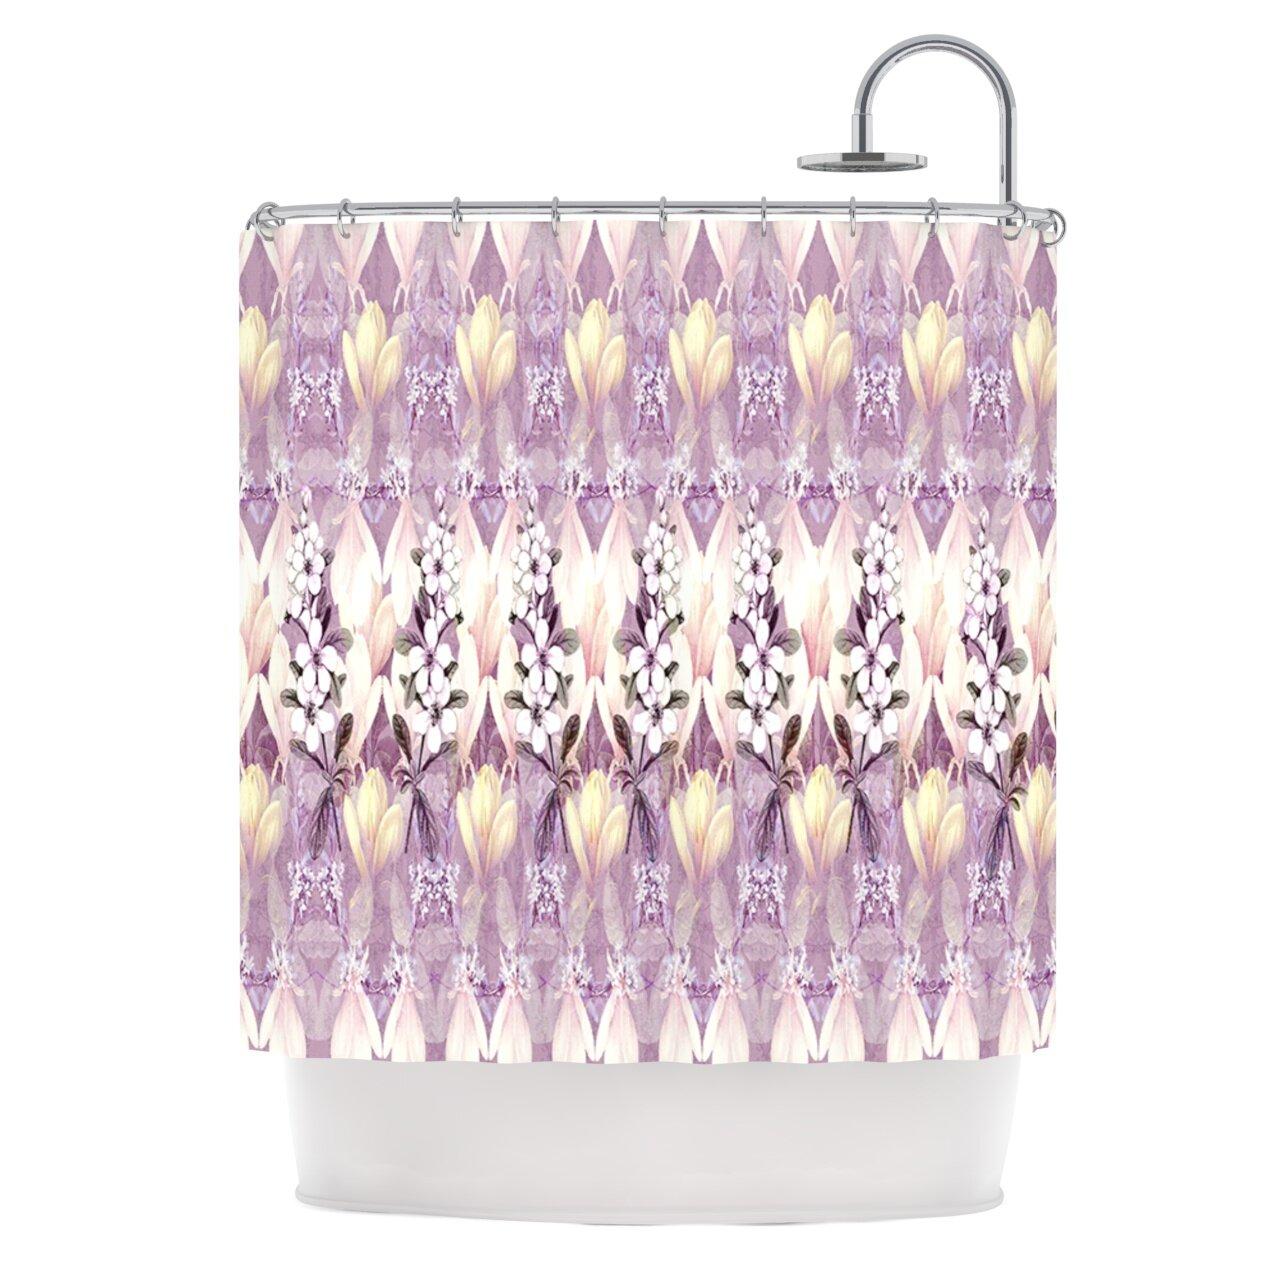 KESS InHouse Laurel85 Polyester Shower Curtain